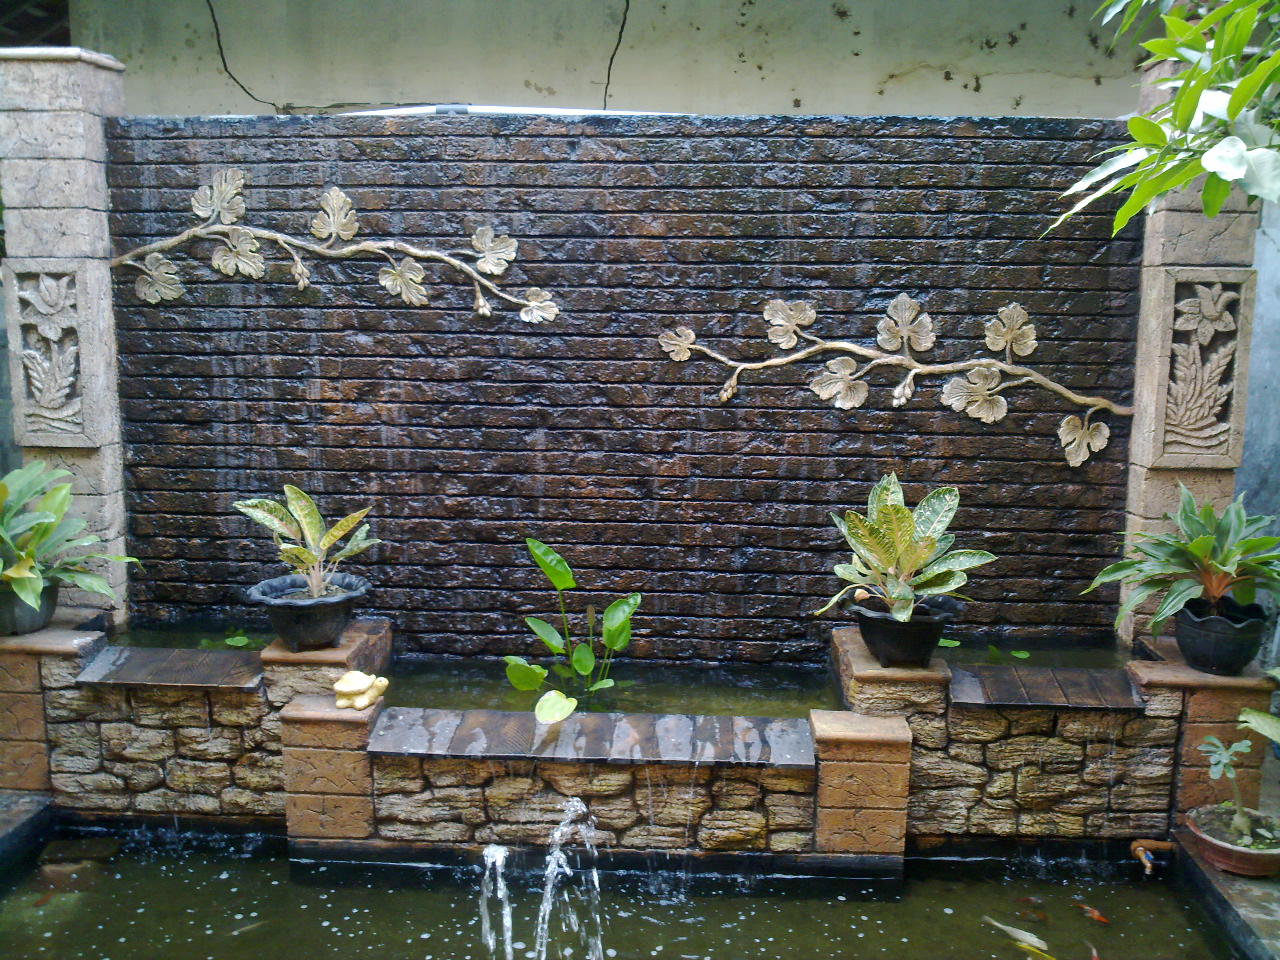 Homemade Water Fountain For Unique Small Garden View ... on Home Garden Fountain Design id=49276